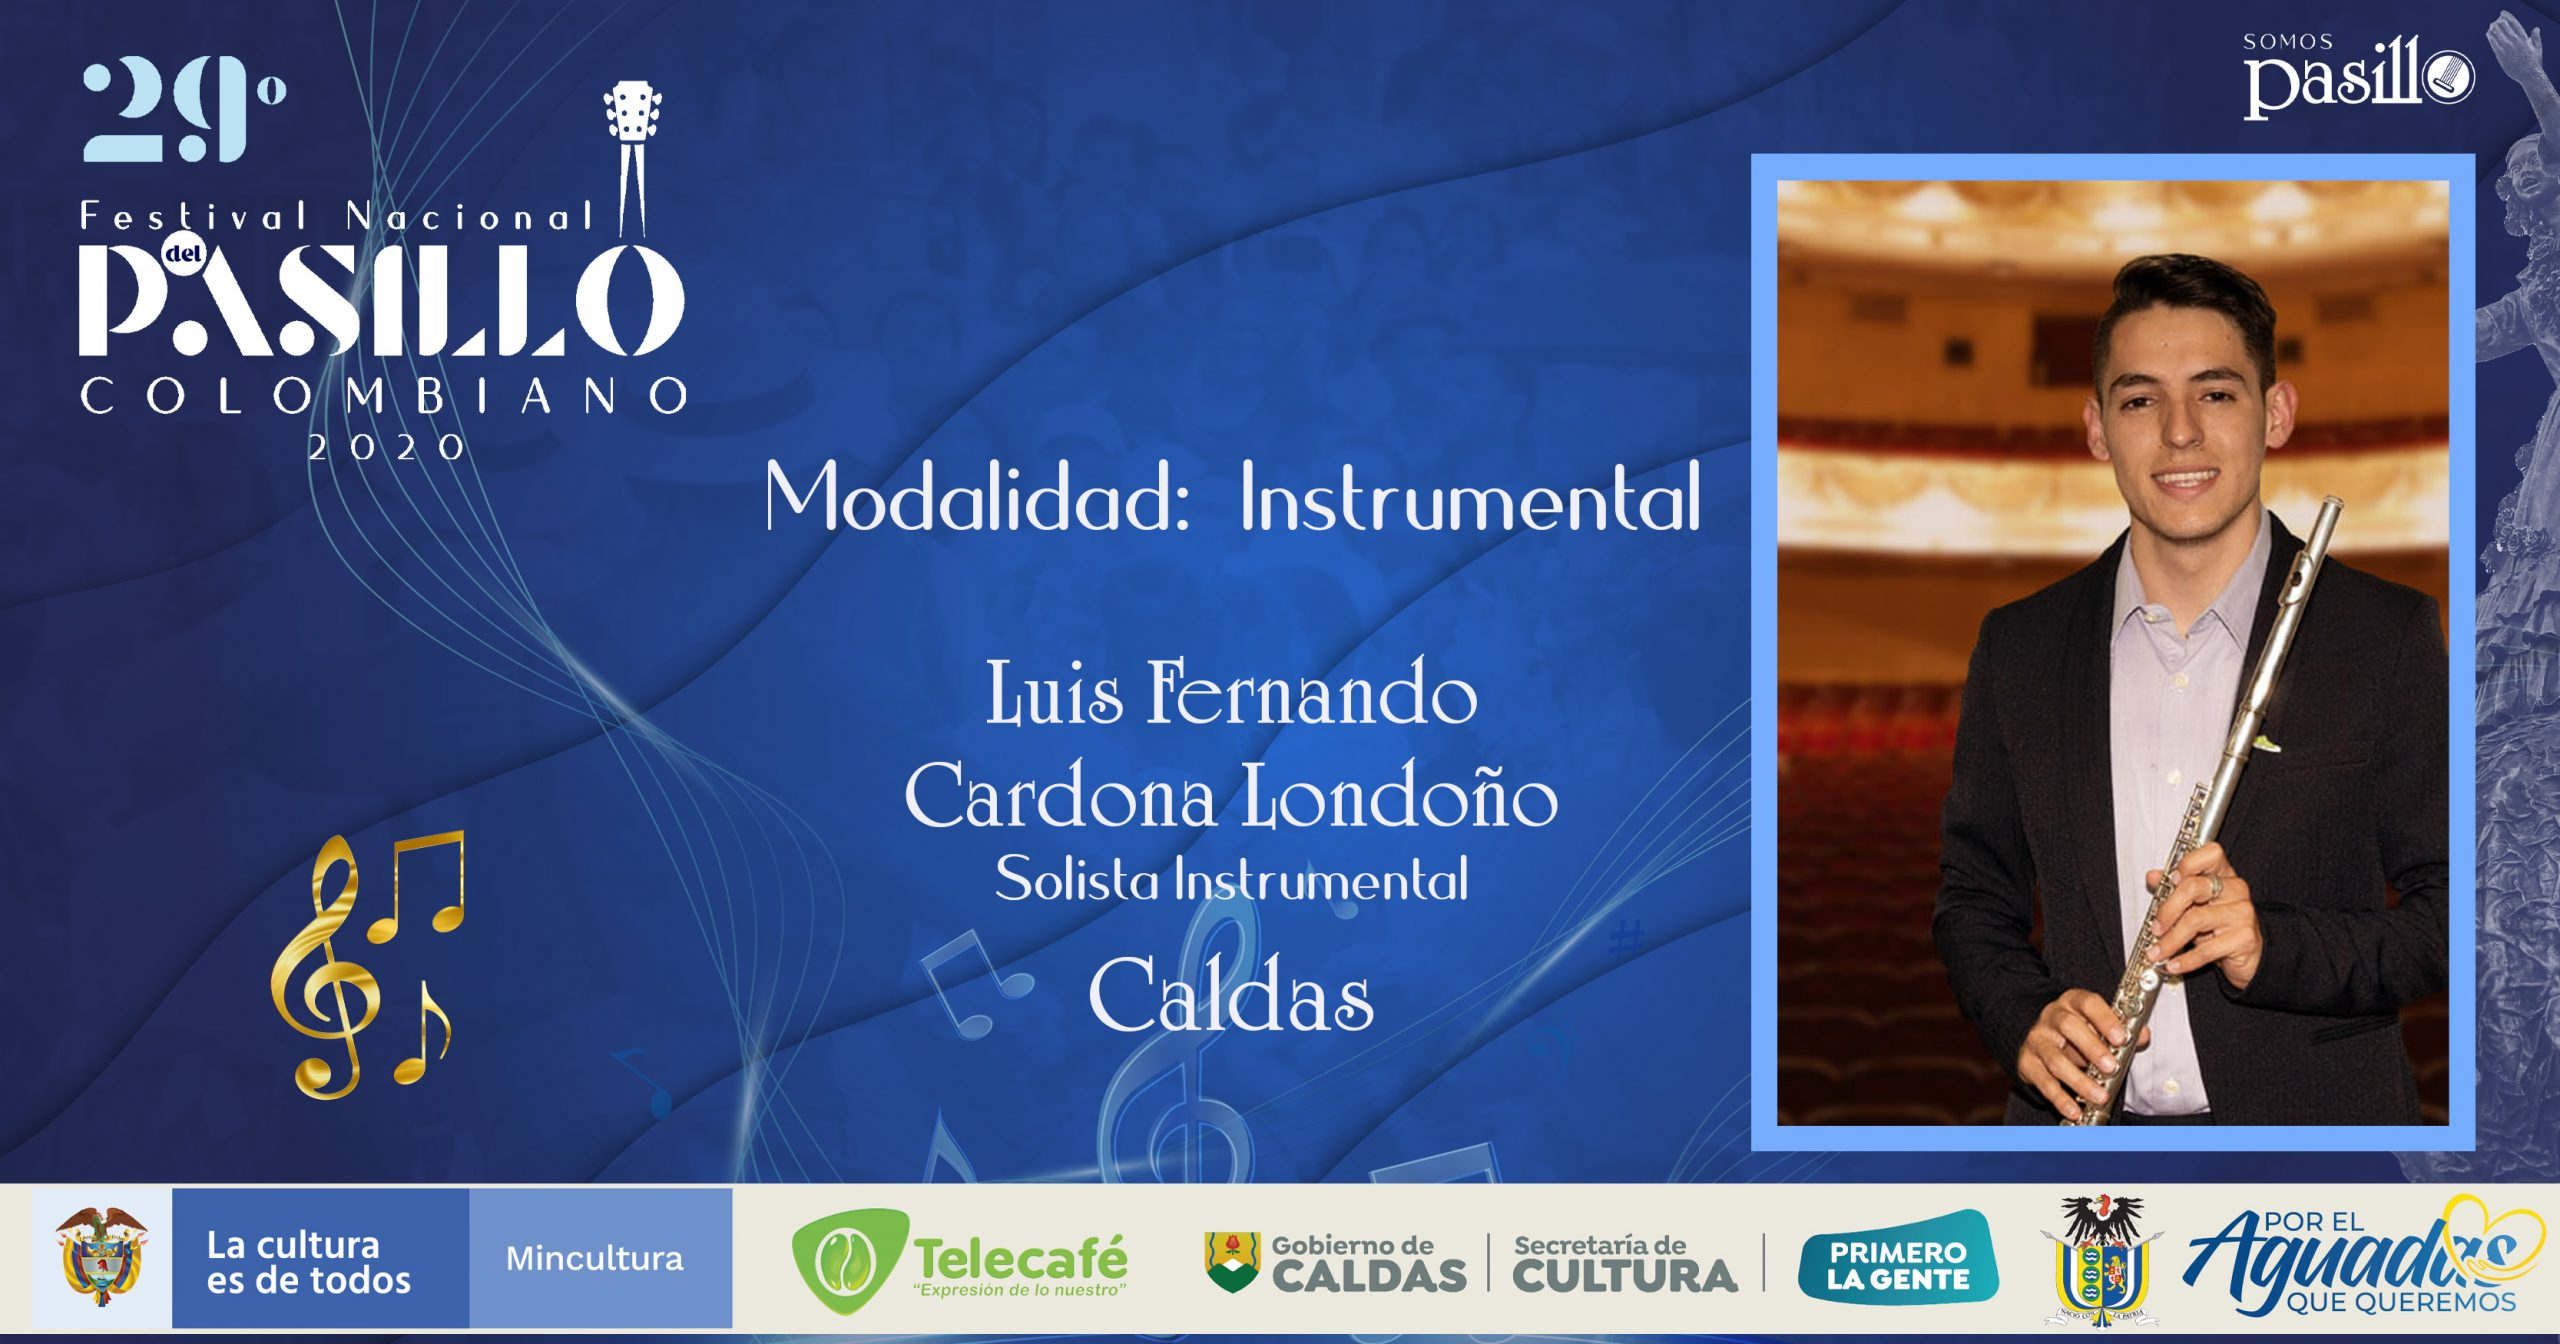 Luis Fernando Cardona Londoño